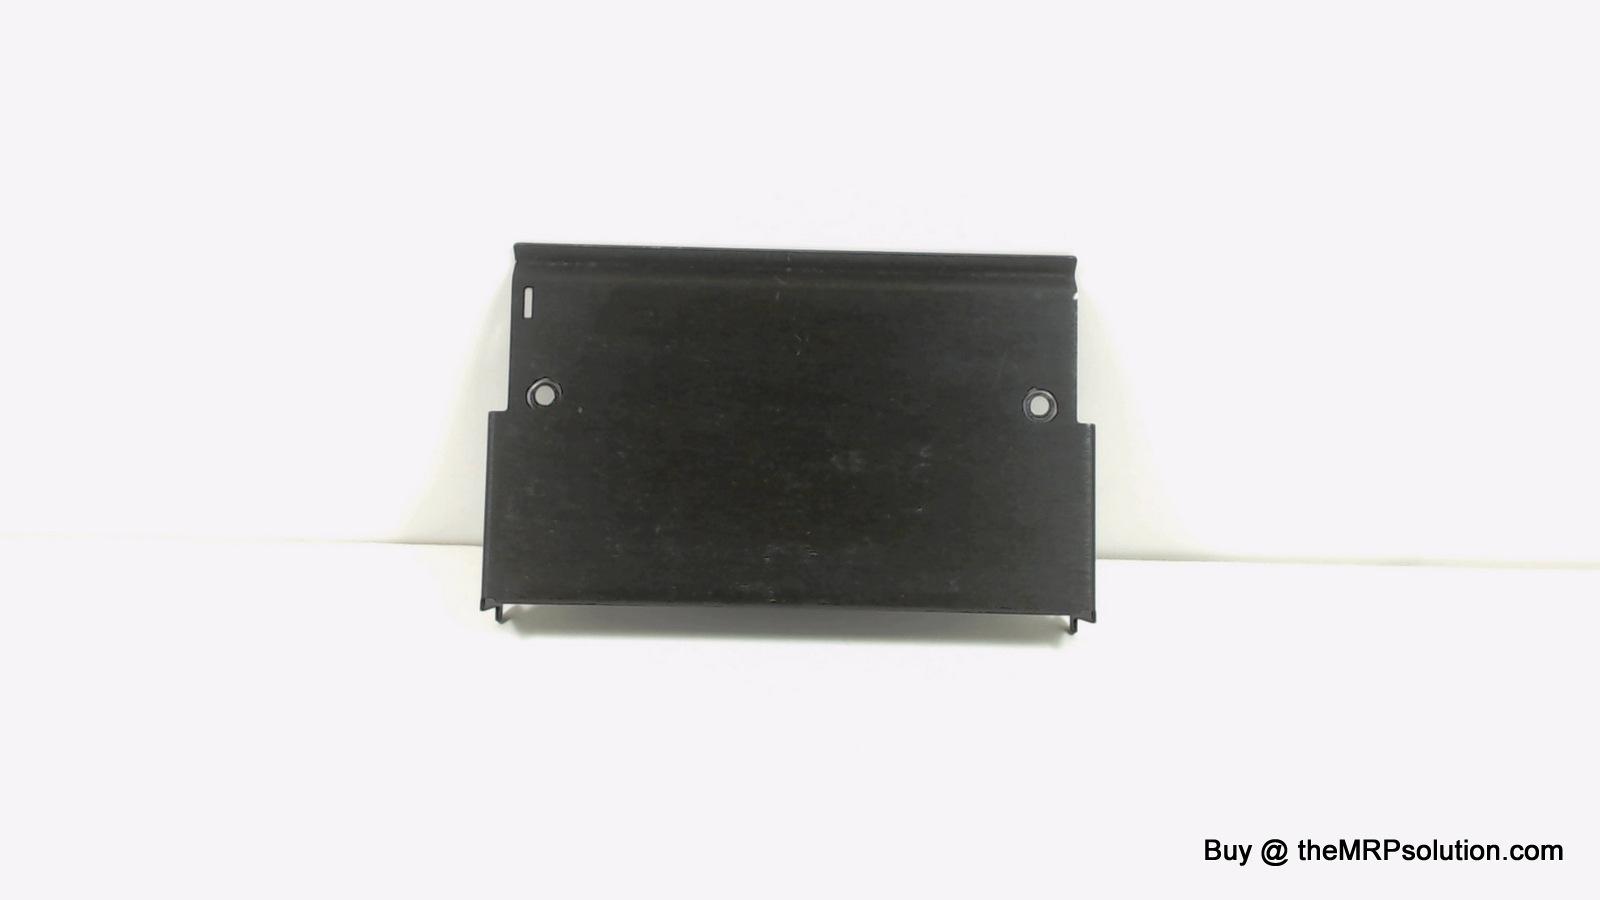 ZEBRA 44282 TEAR-OFF PLATE, S400/S500 New